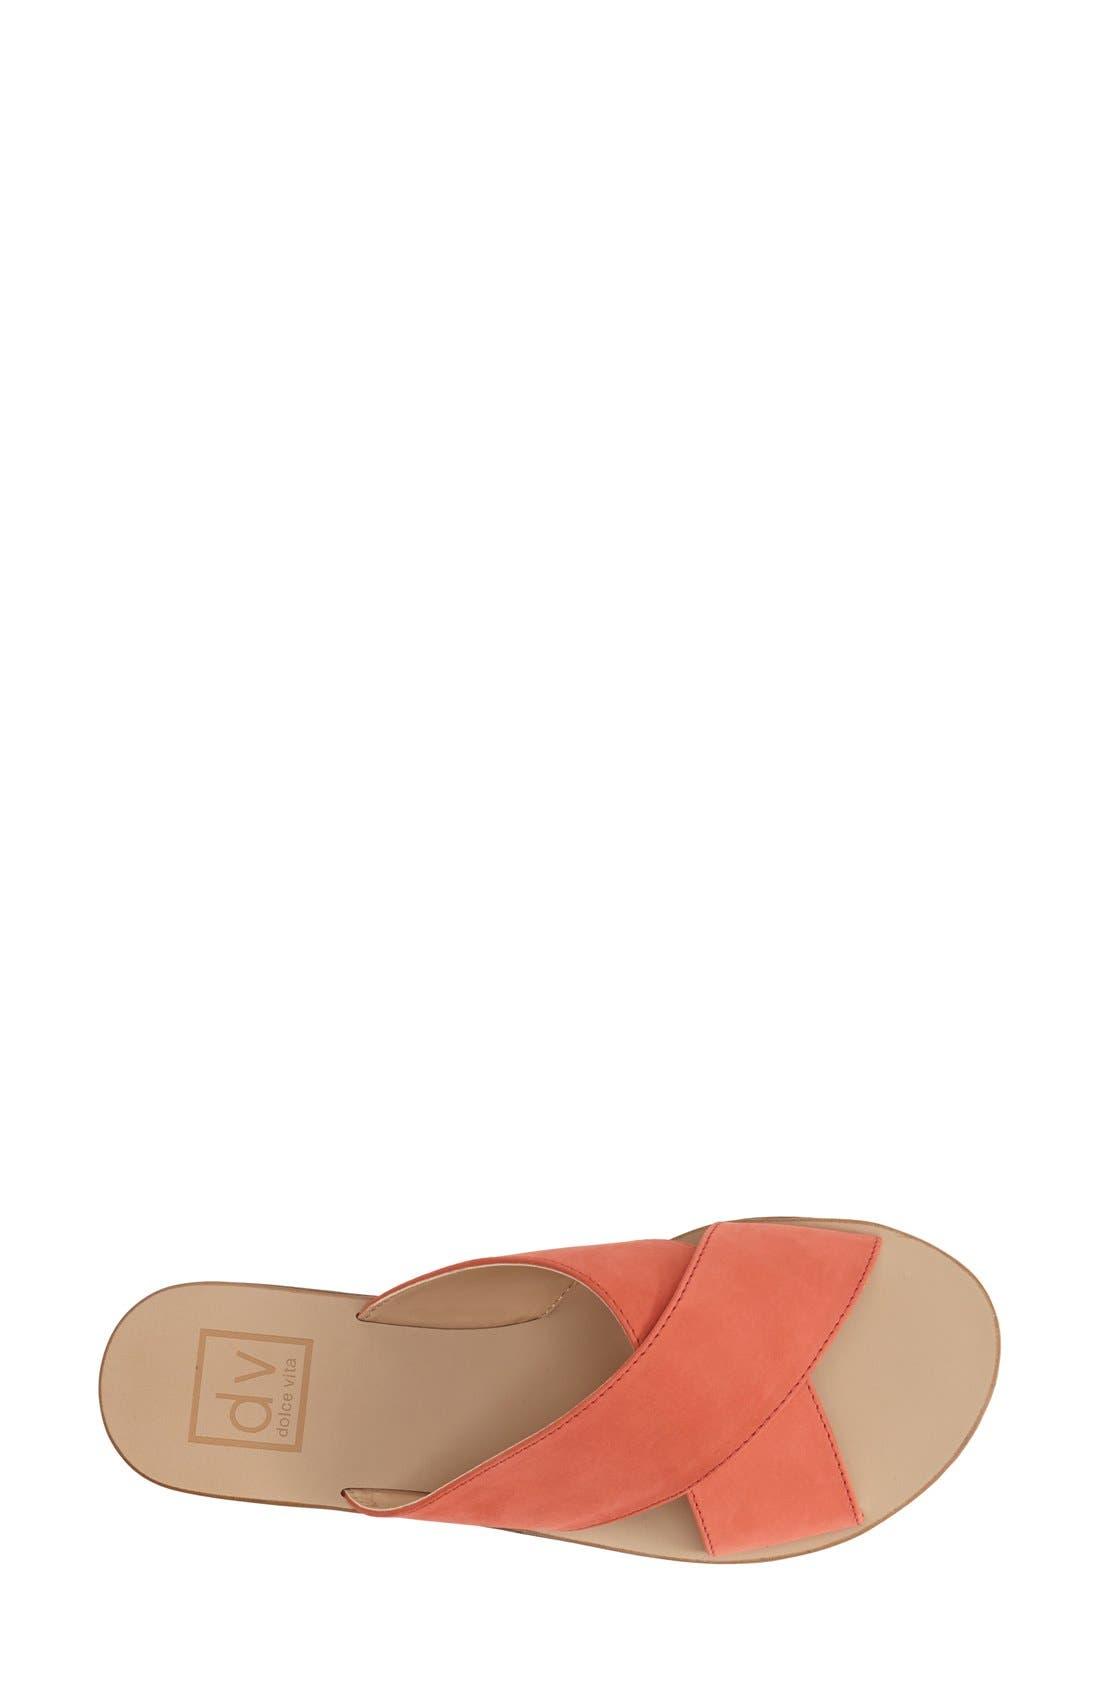 Alternate Image 3  - DV by Dolce Vita 'Orra' Crossover Strap Flat Sandal (Women)